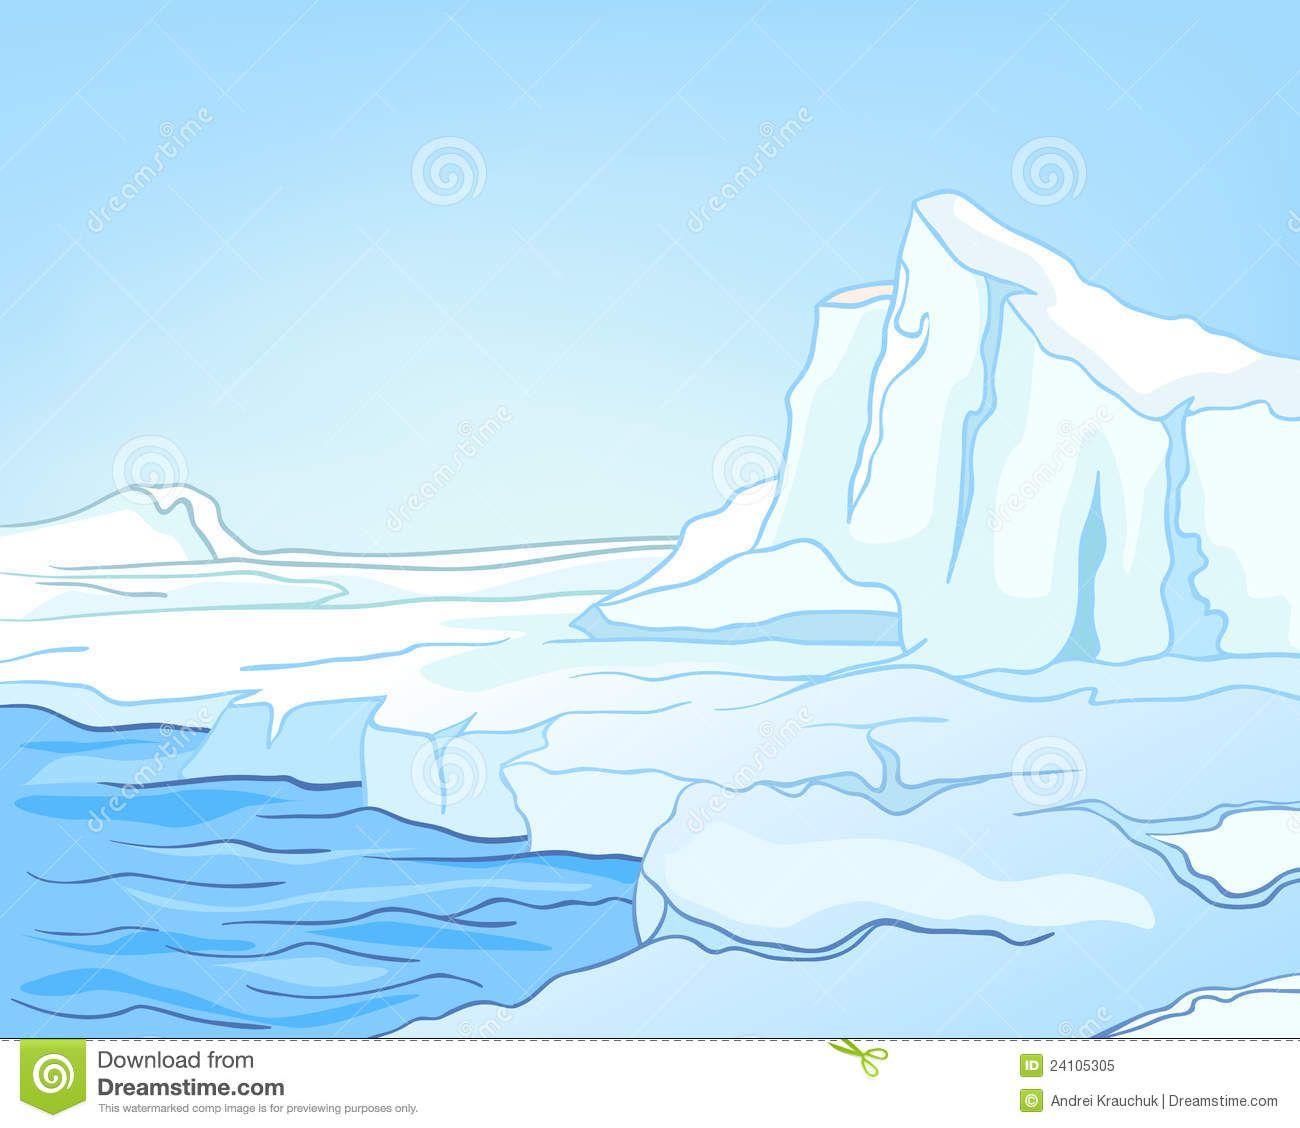 Image result for antarctica. Glacier clipart landscape arctic